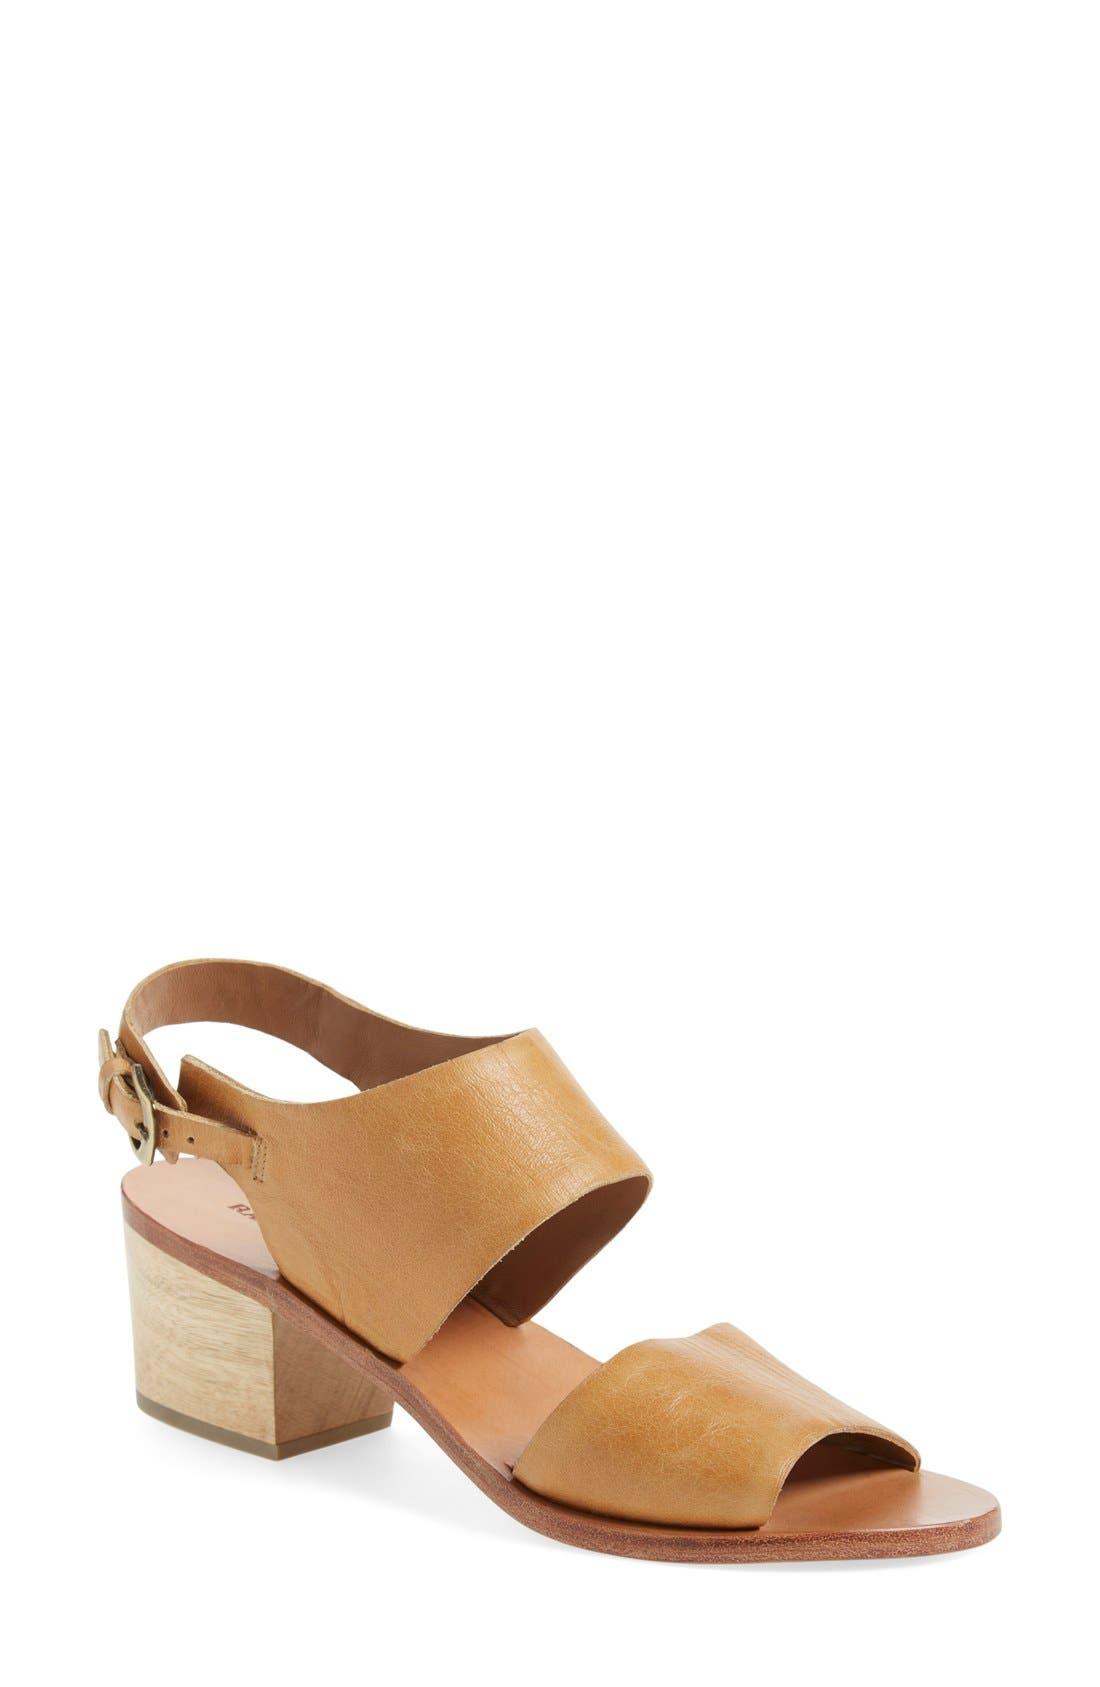 Alternate Image 1 Selected - Rachel Comey 'Tulip' Sandal (Women)